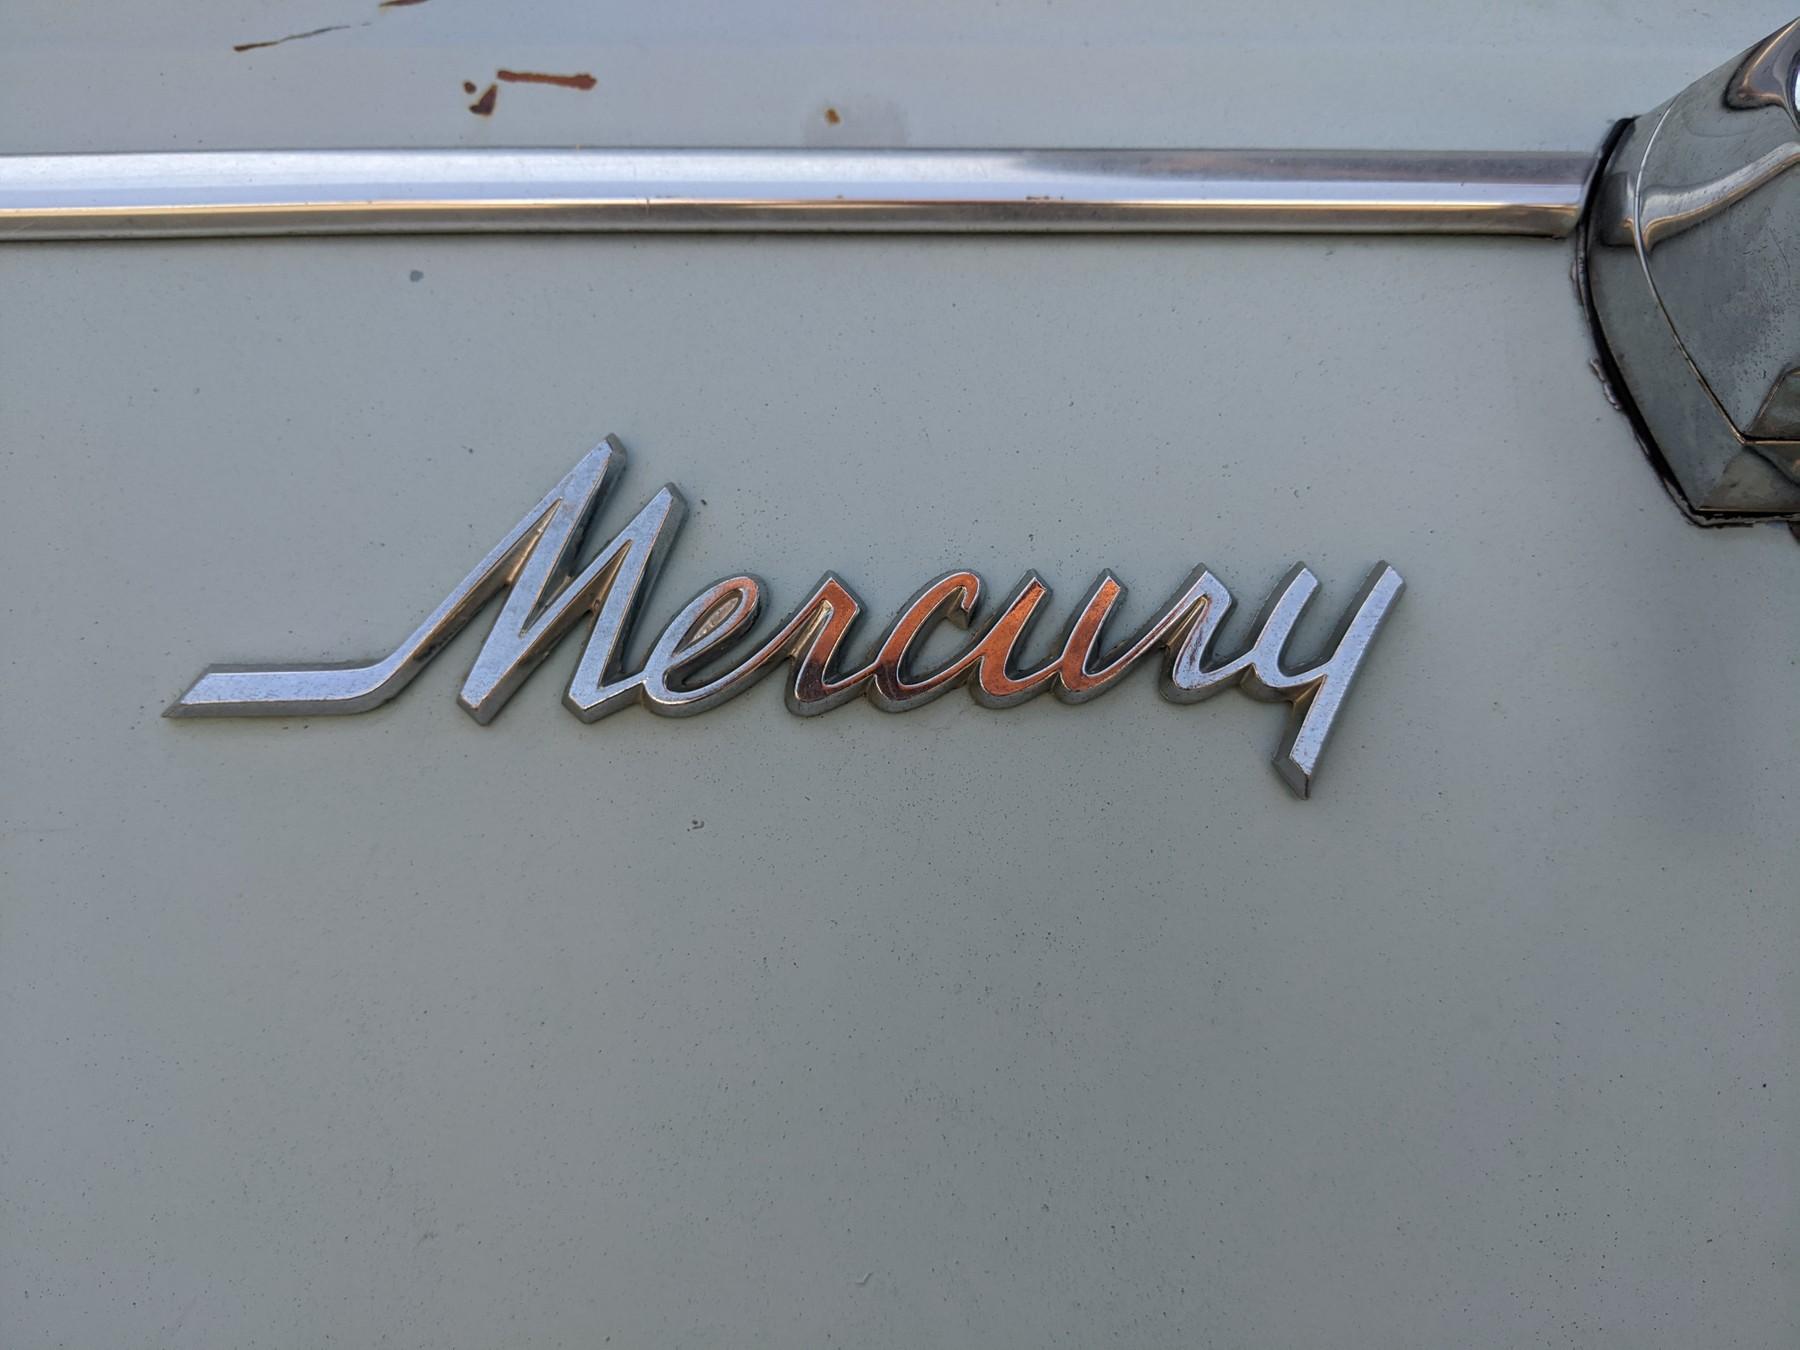 Mercury Vehicle, Berkeley CA